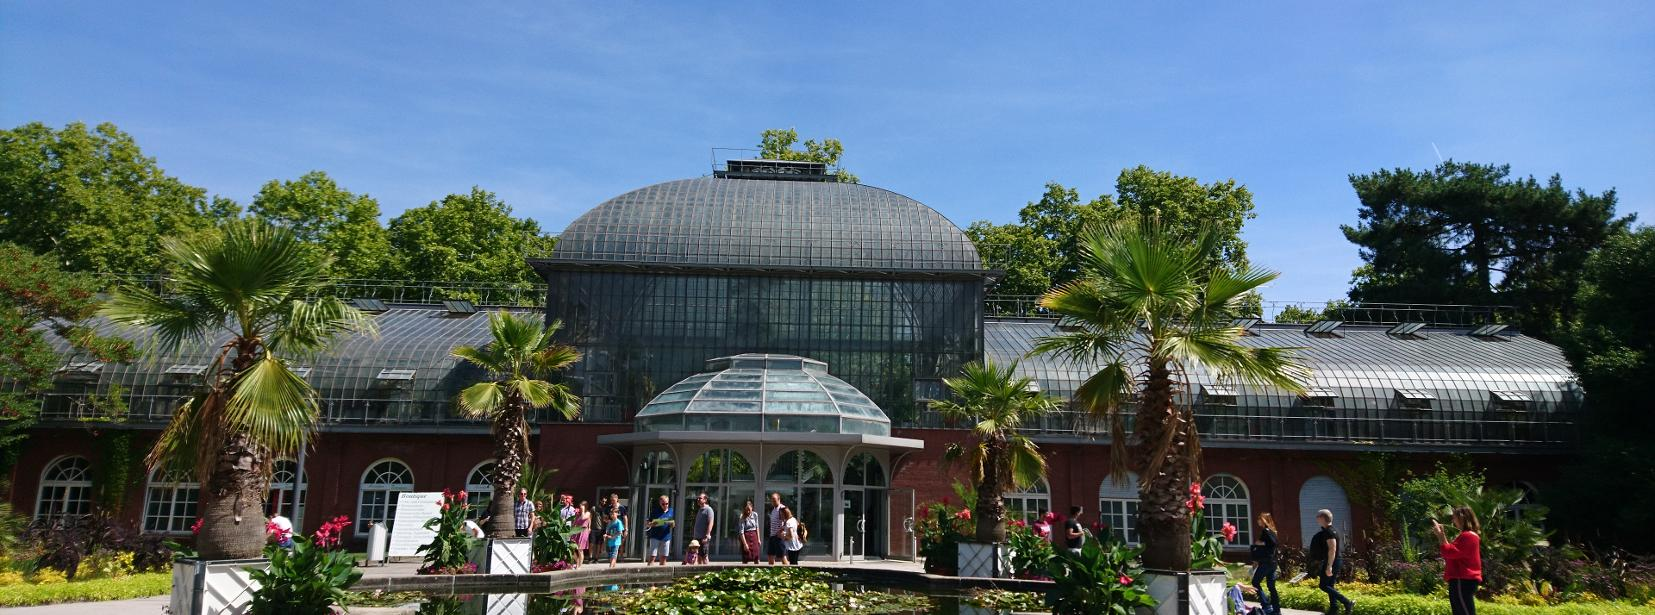 visiter francfort 2 jours jardin palmengarten